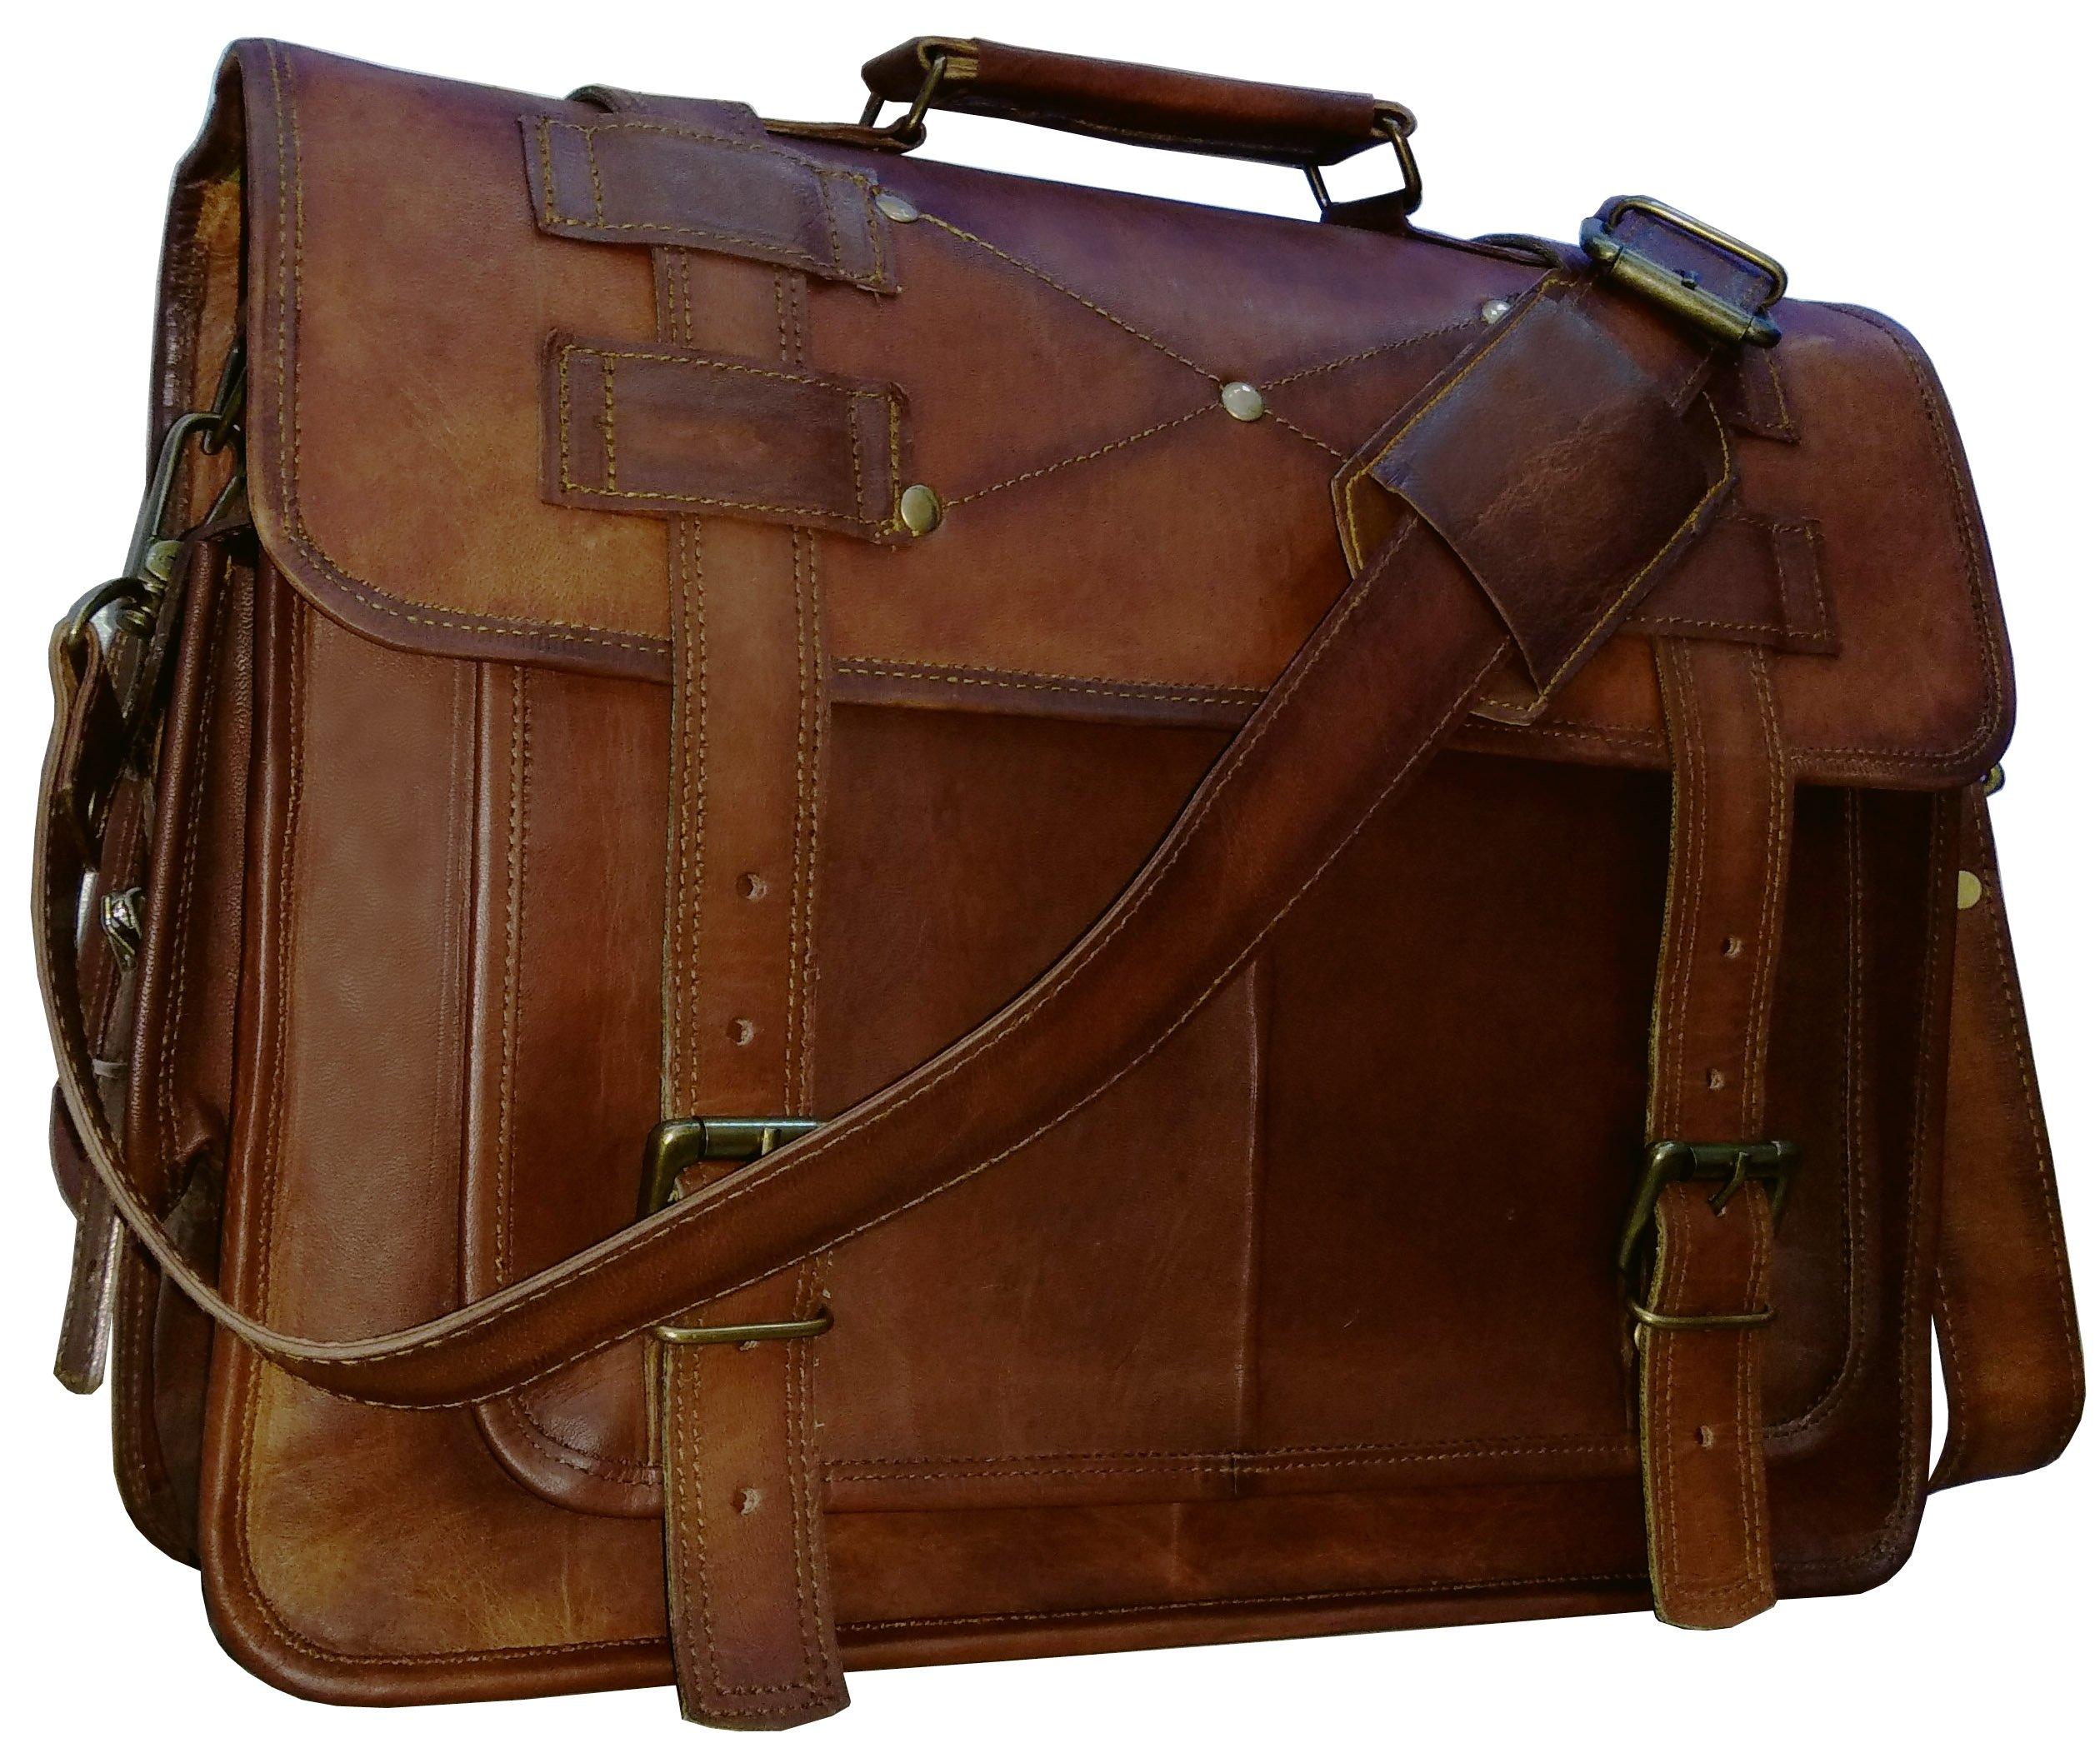 16'' leather messenger bags for men women mens briefcase laptop bag best computer shoulder satchel school distressed bag by VINTAGE COUTURE by VINTAGE COUTURE